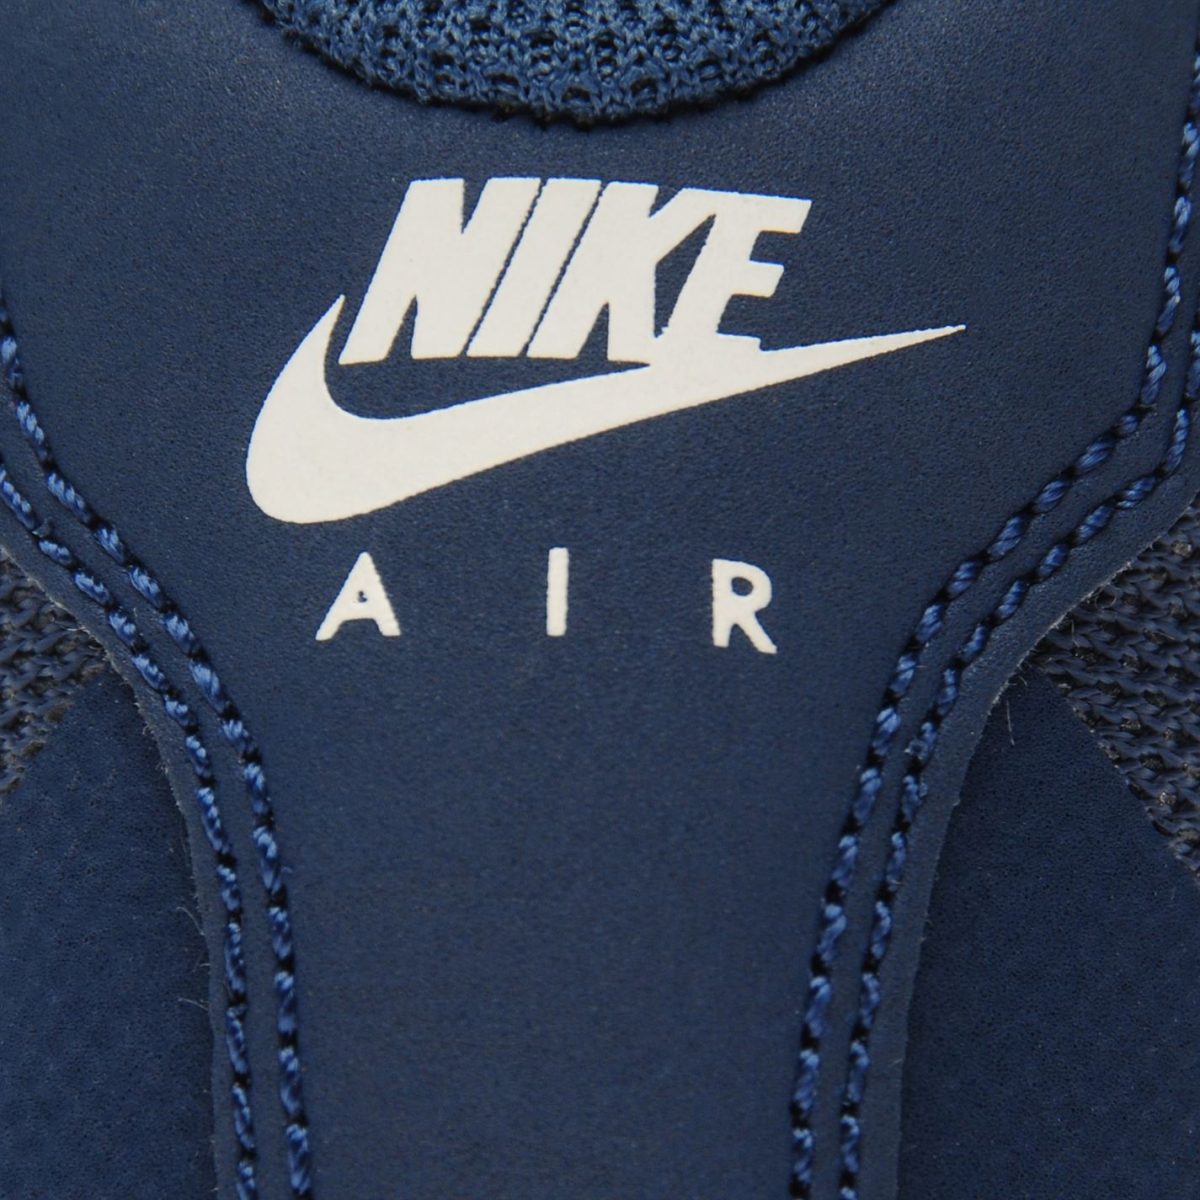 Details zu Nike Air Max Invigor Turnschuhe Laufschuhe Kinder Jungen Sneaker Trainers 1010